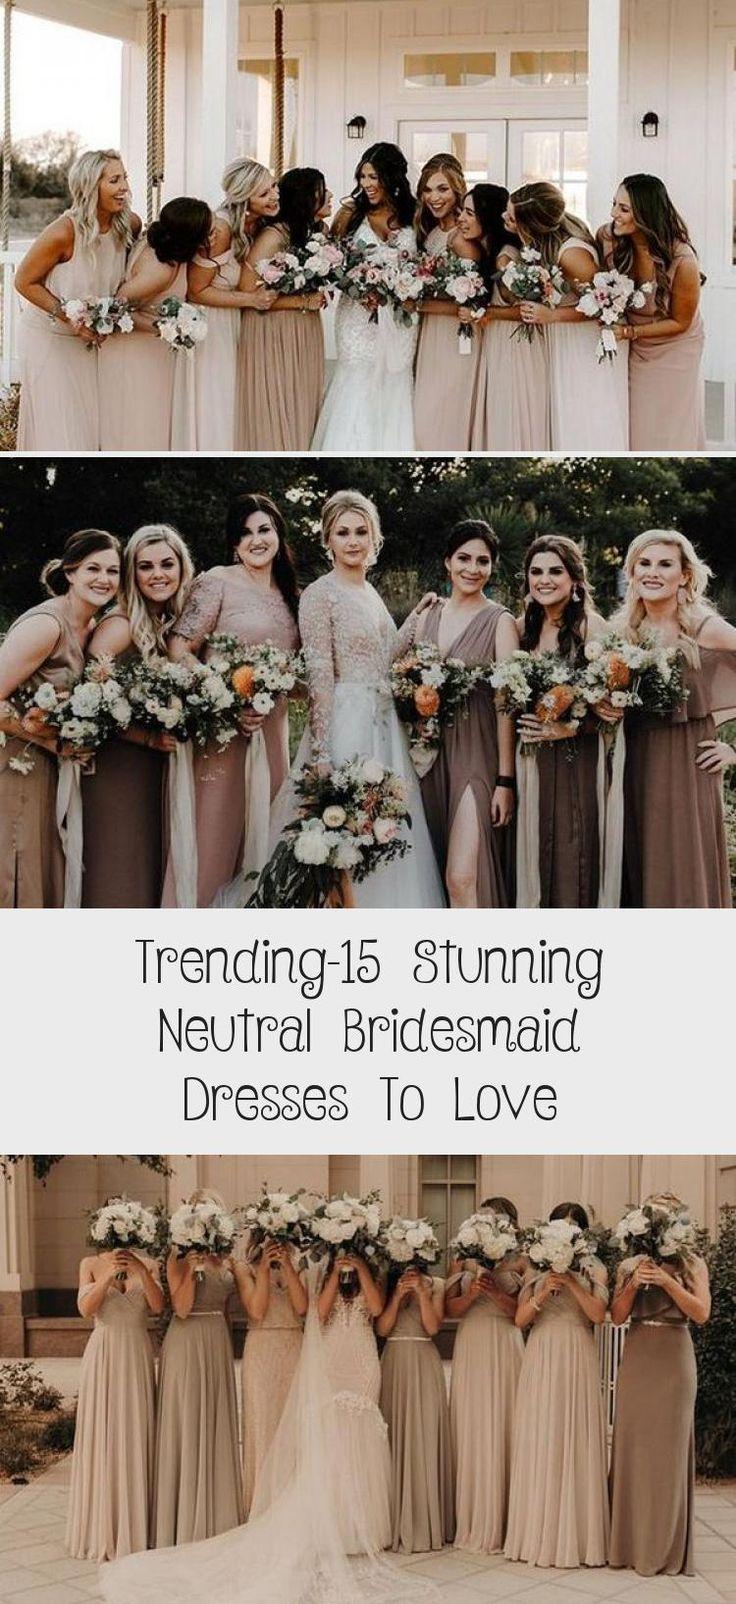 neutral champagne bridesmaid dresses #obde #weddingideas2019 #CheapBridesmaidDresses #BridesmaidDressesDustyRose #BridesmaidDressesTeaLength #BridesmaidDressesPastel #BridesmaidDressesWithSleeves